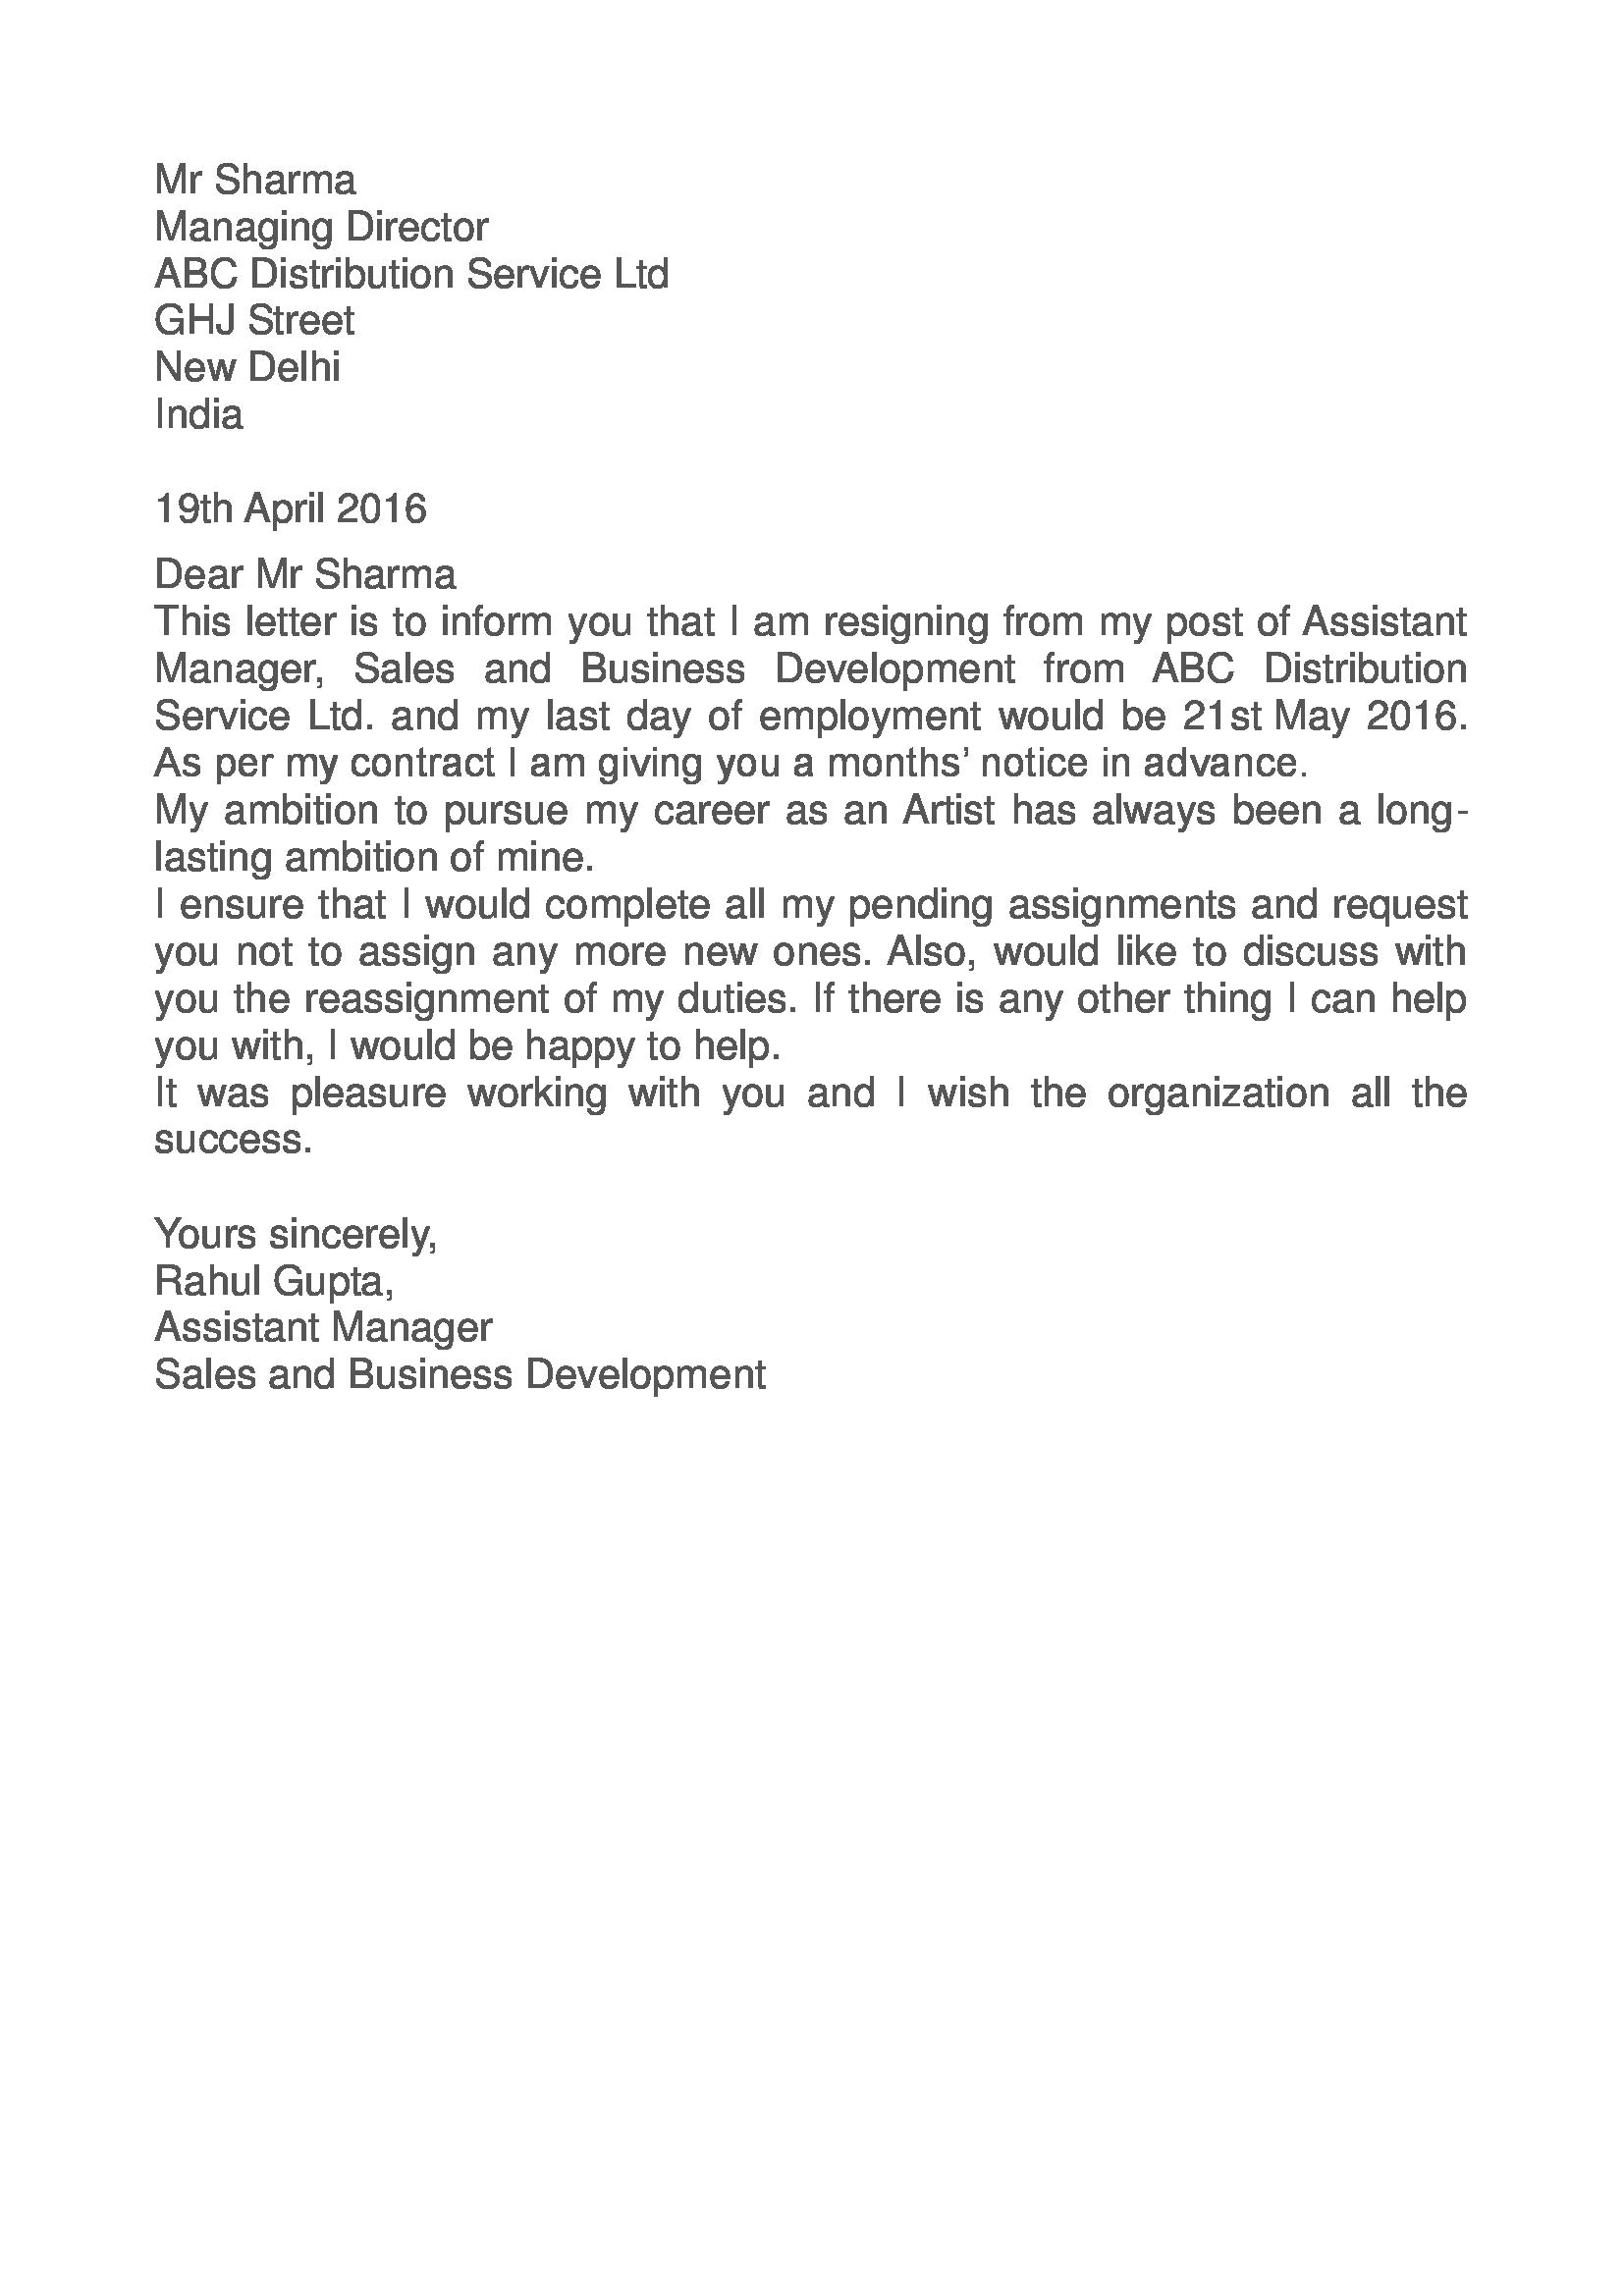 doc of resume